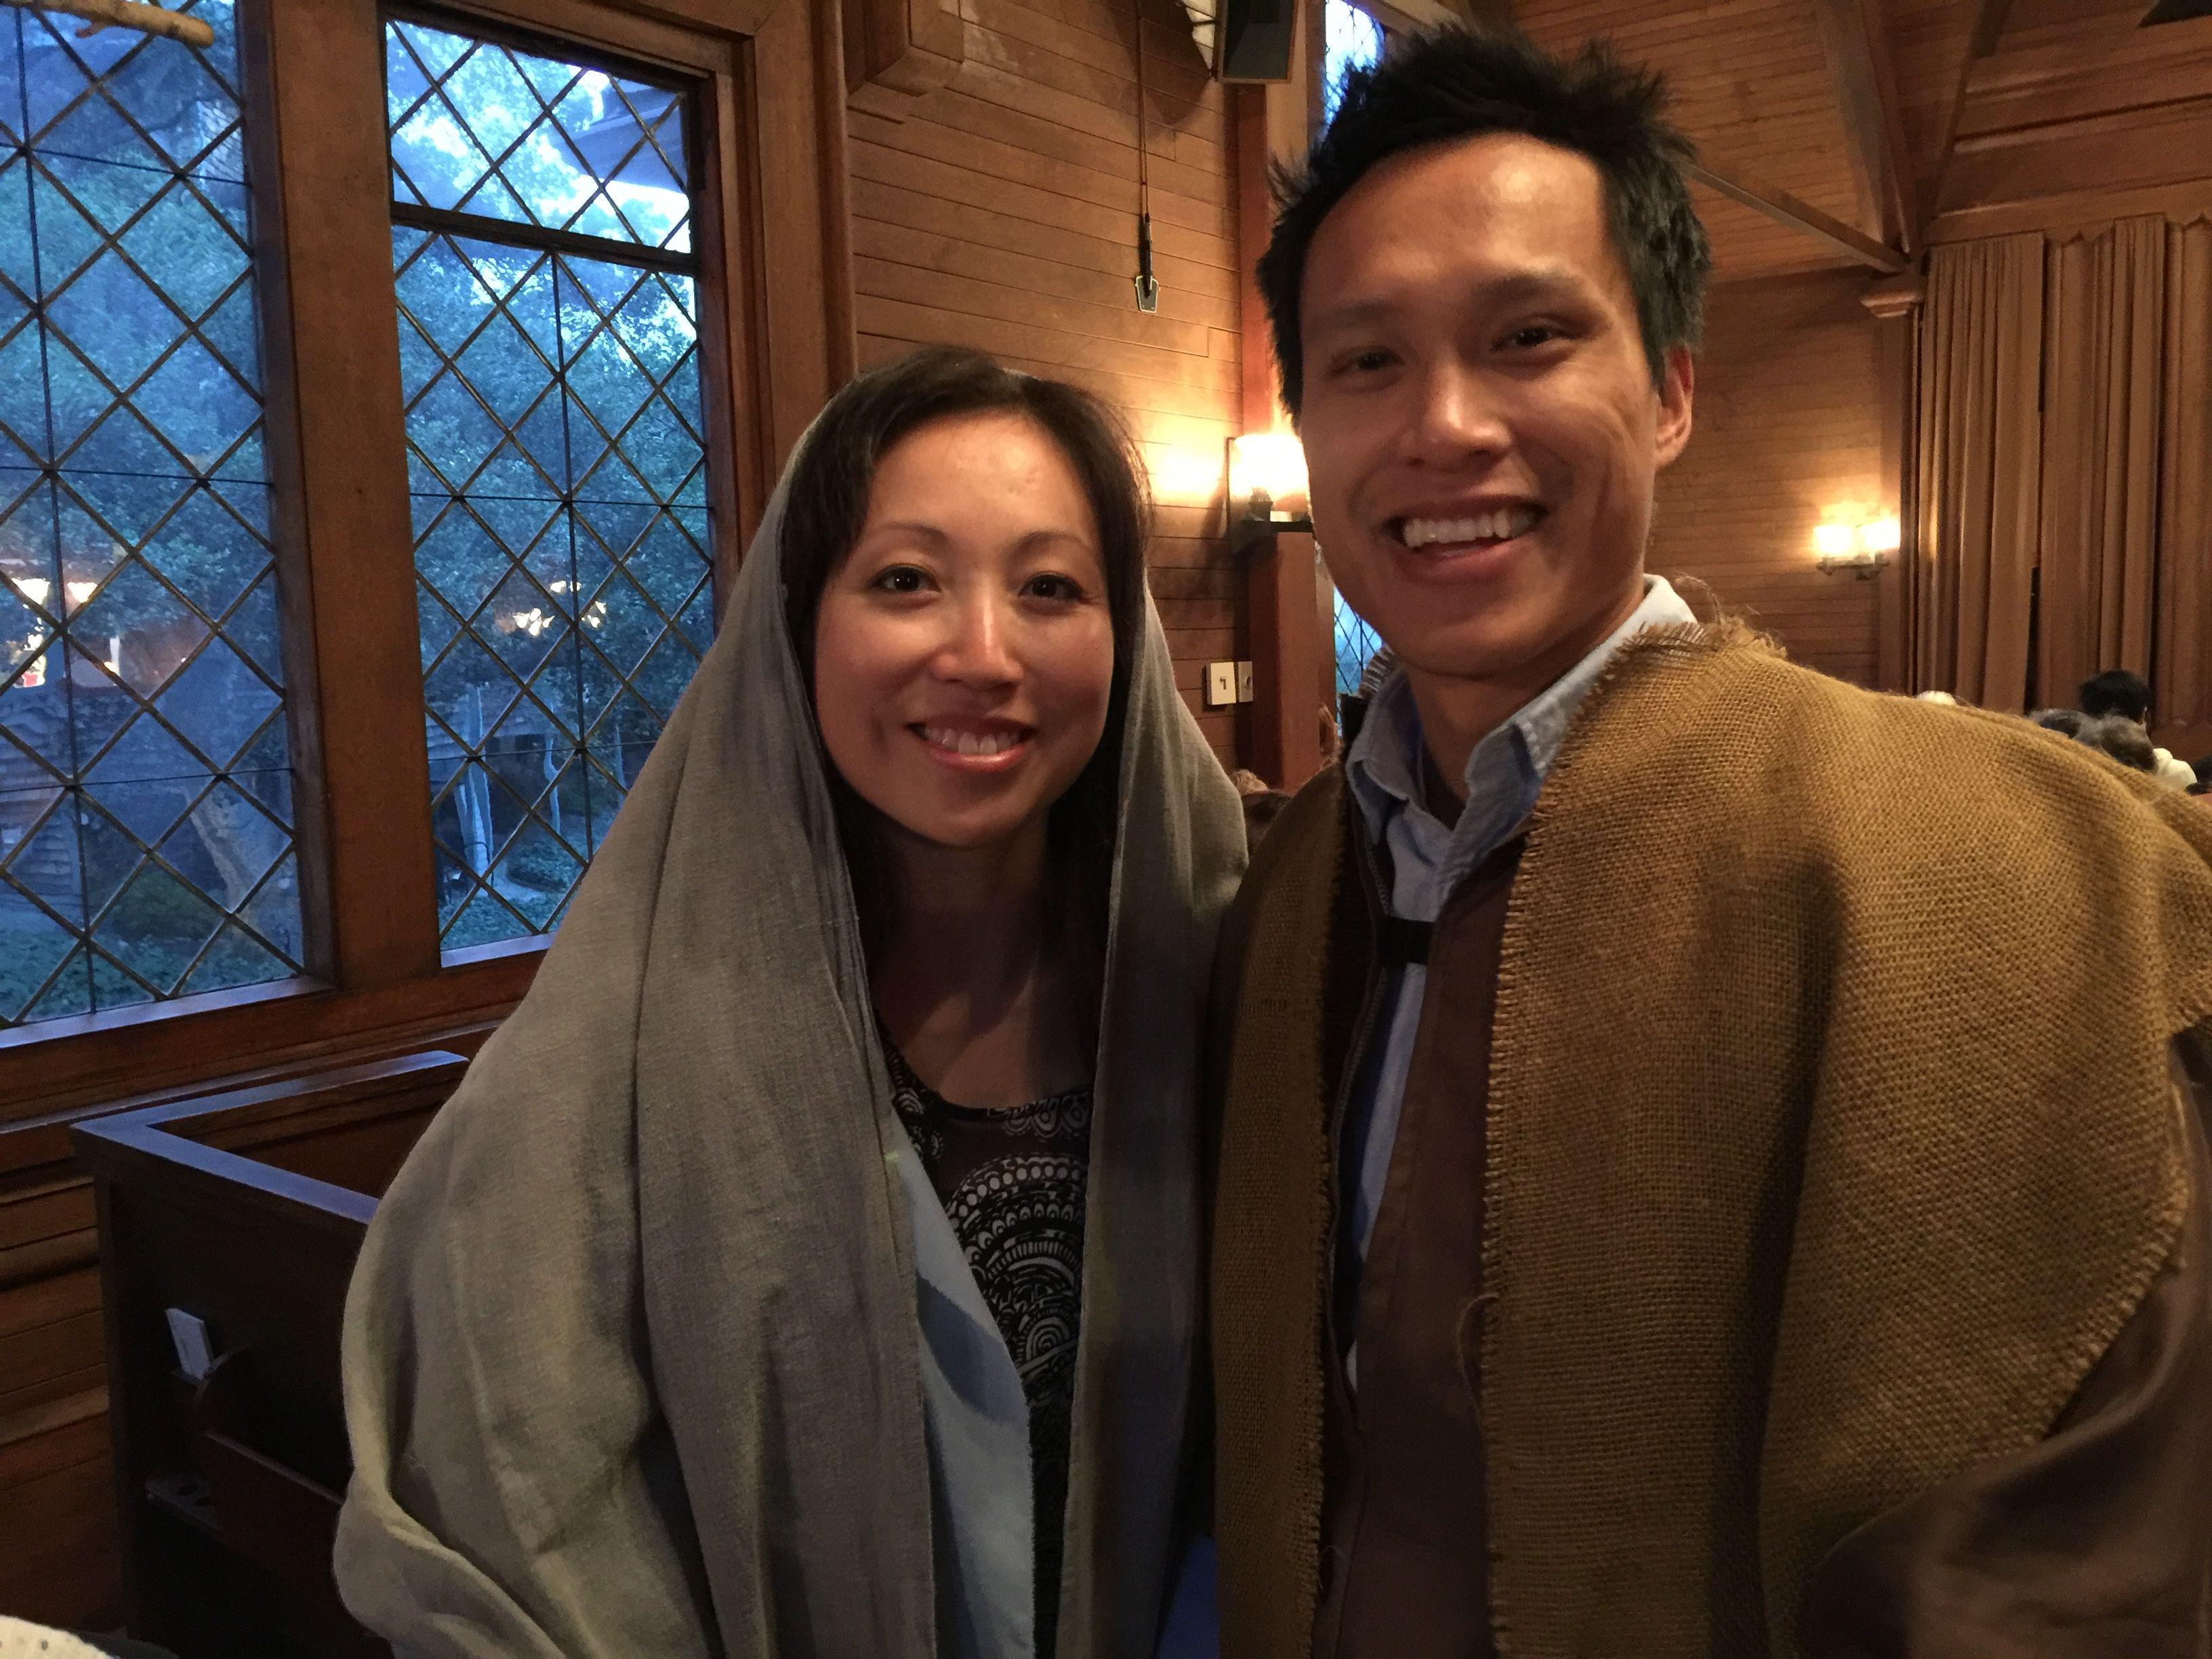 Angela and John IMG_2765